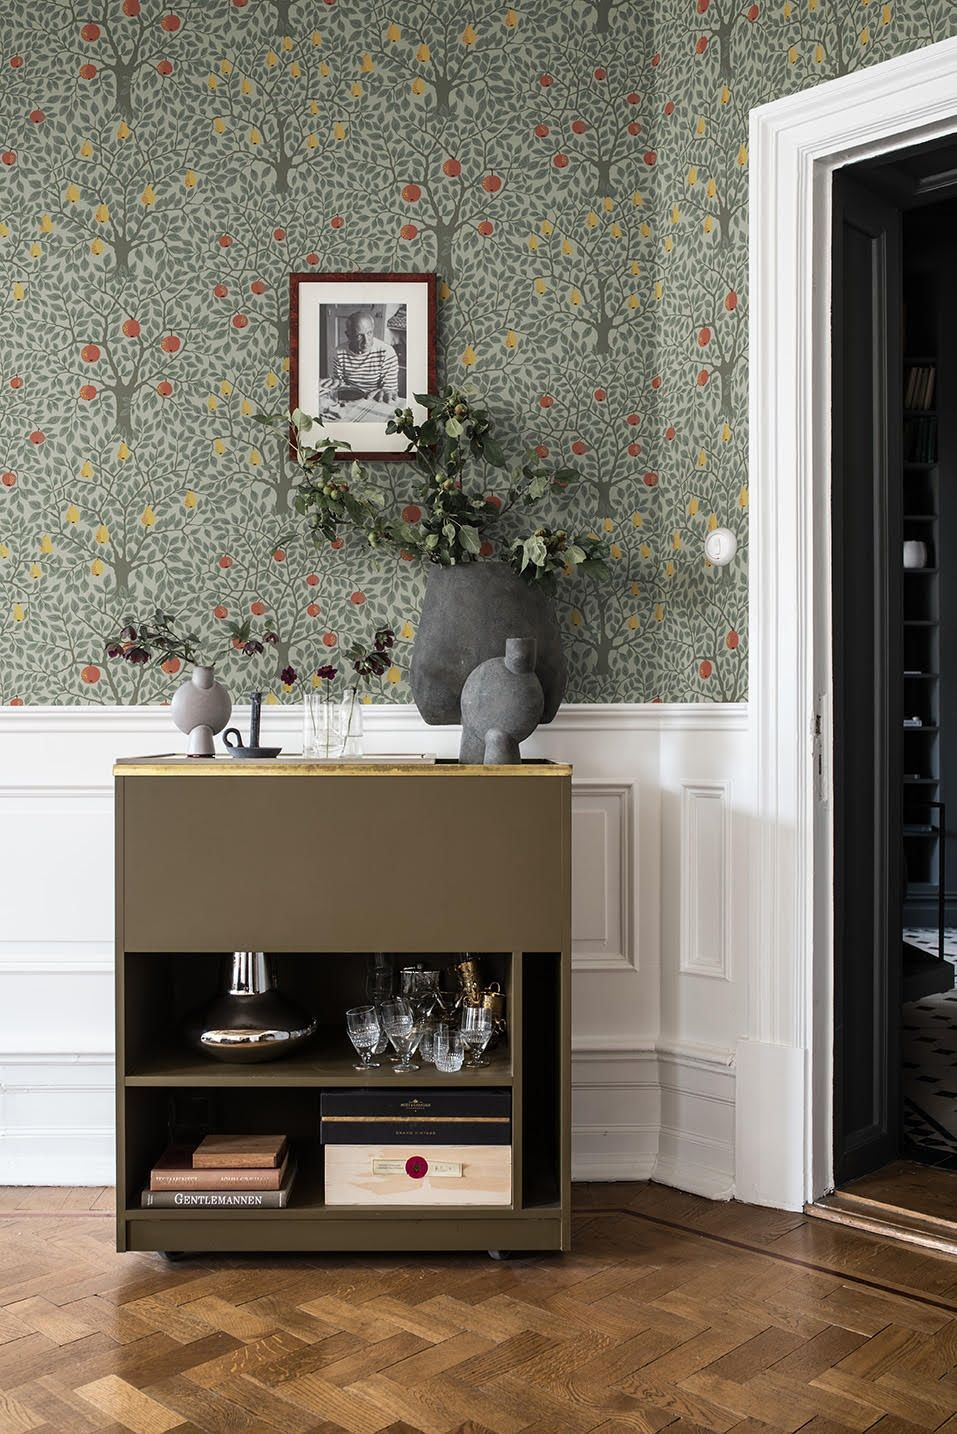 Tree Design Wallpaper Living Room: Bedroom Feature Wallpaper, Wallpaper